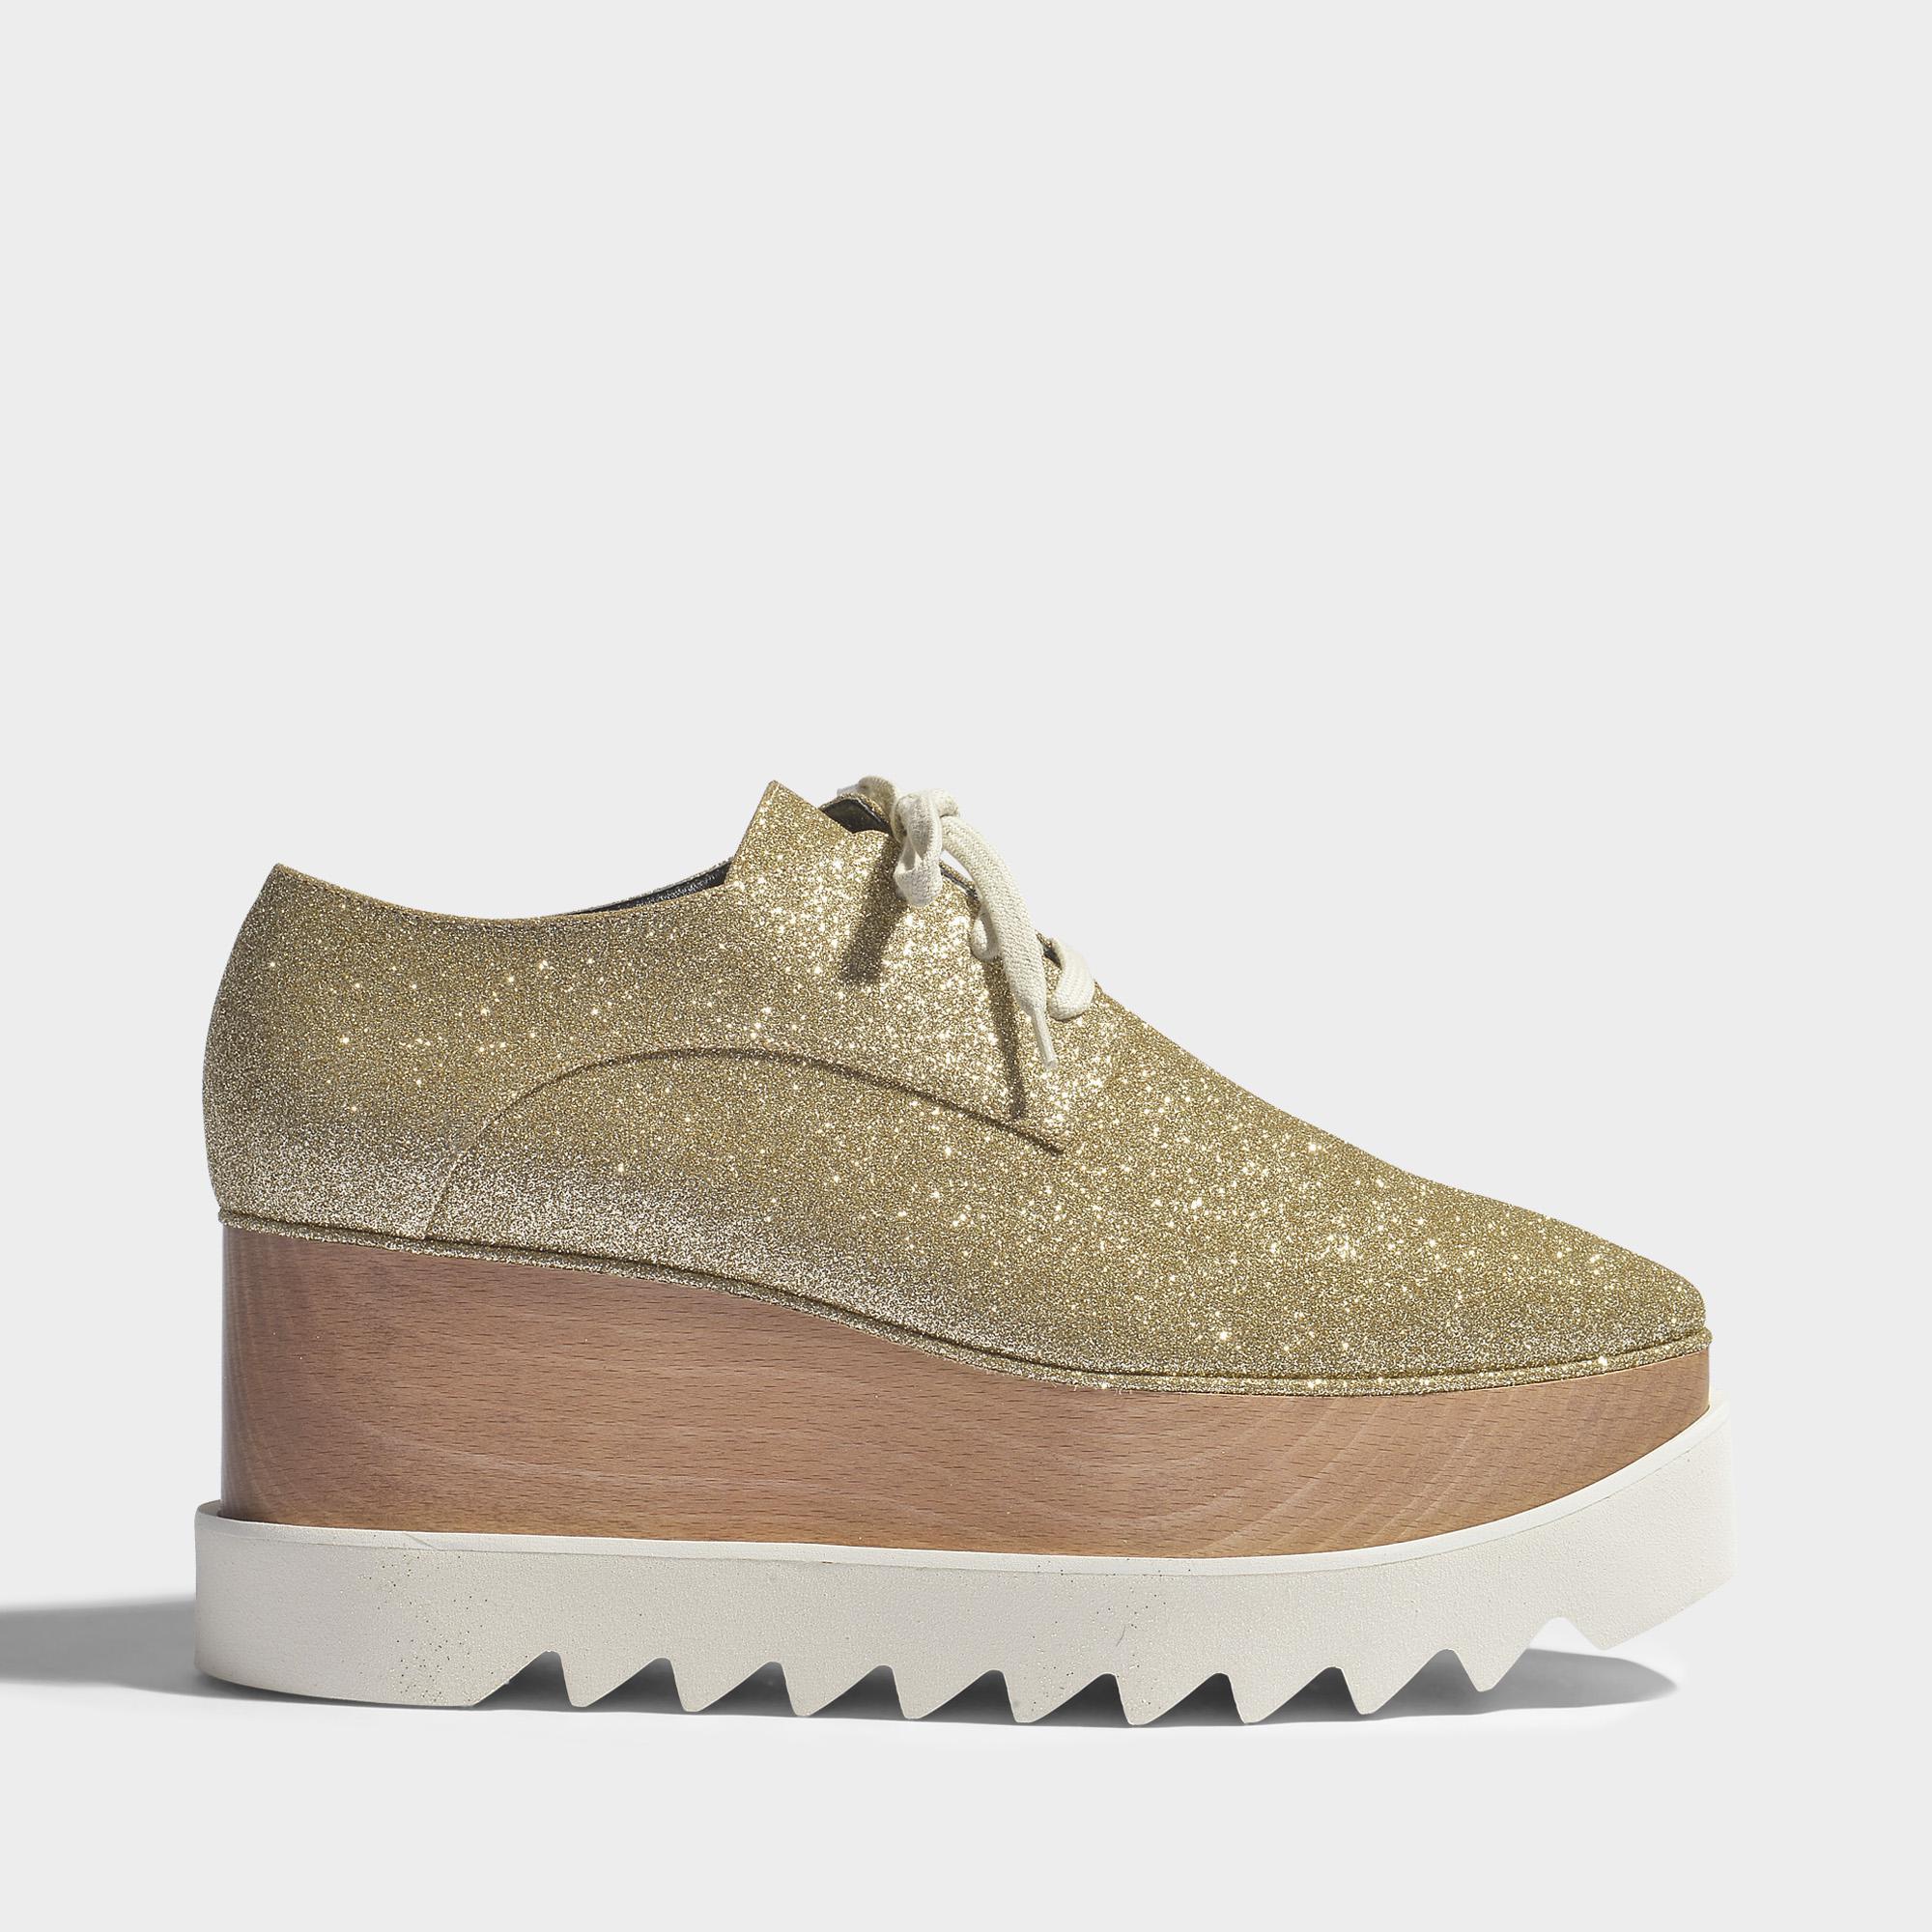 pretty nice 9f139 dd5c9 stella-mccartney-Metallic-Elyse-Platform-Shoes -In-Light-Gold-Synthetic-Fabric.jpeg